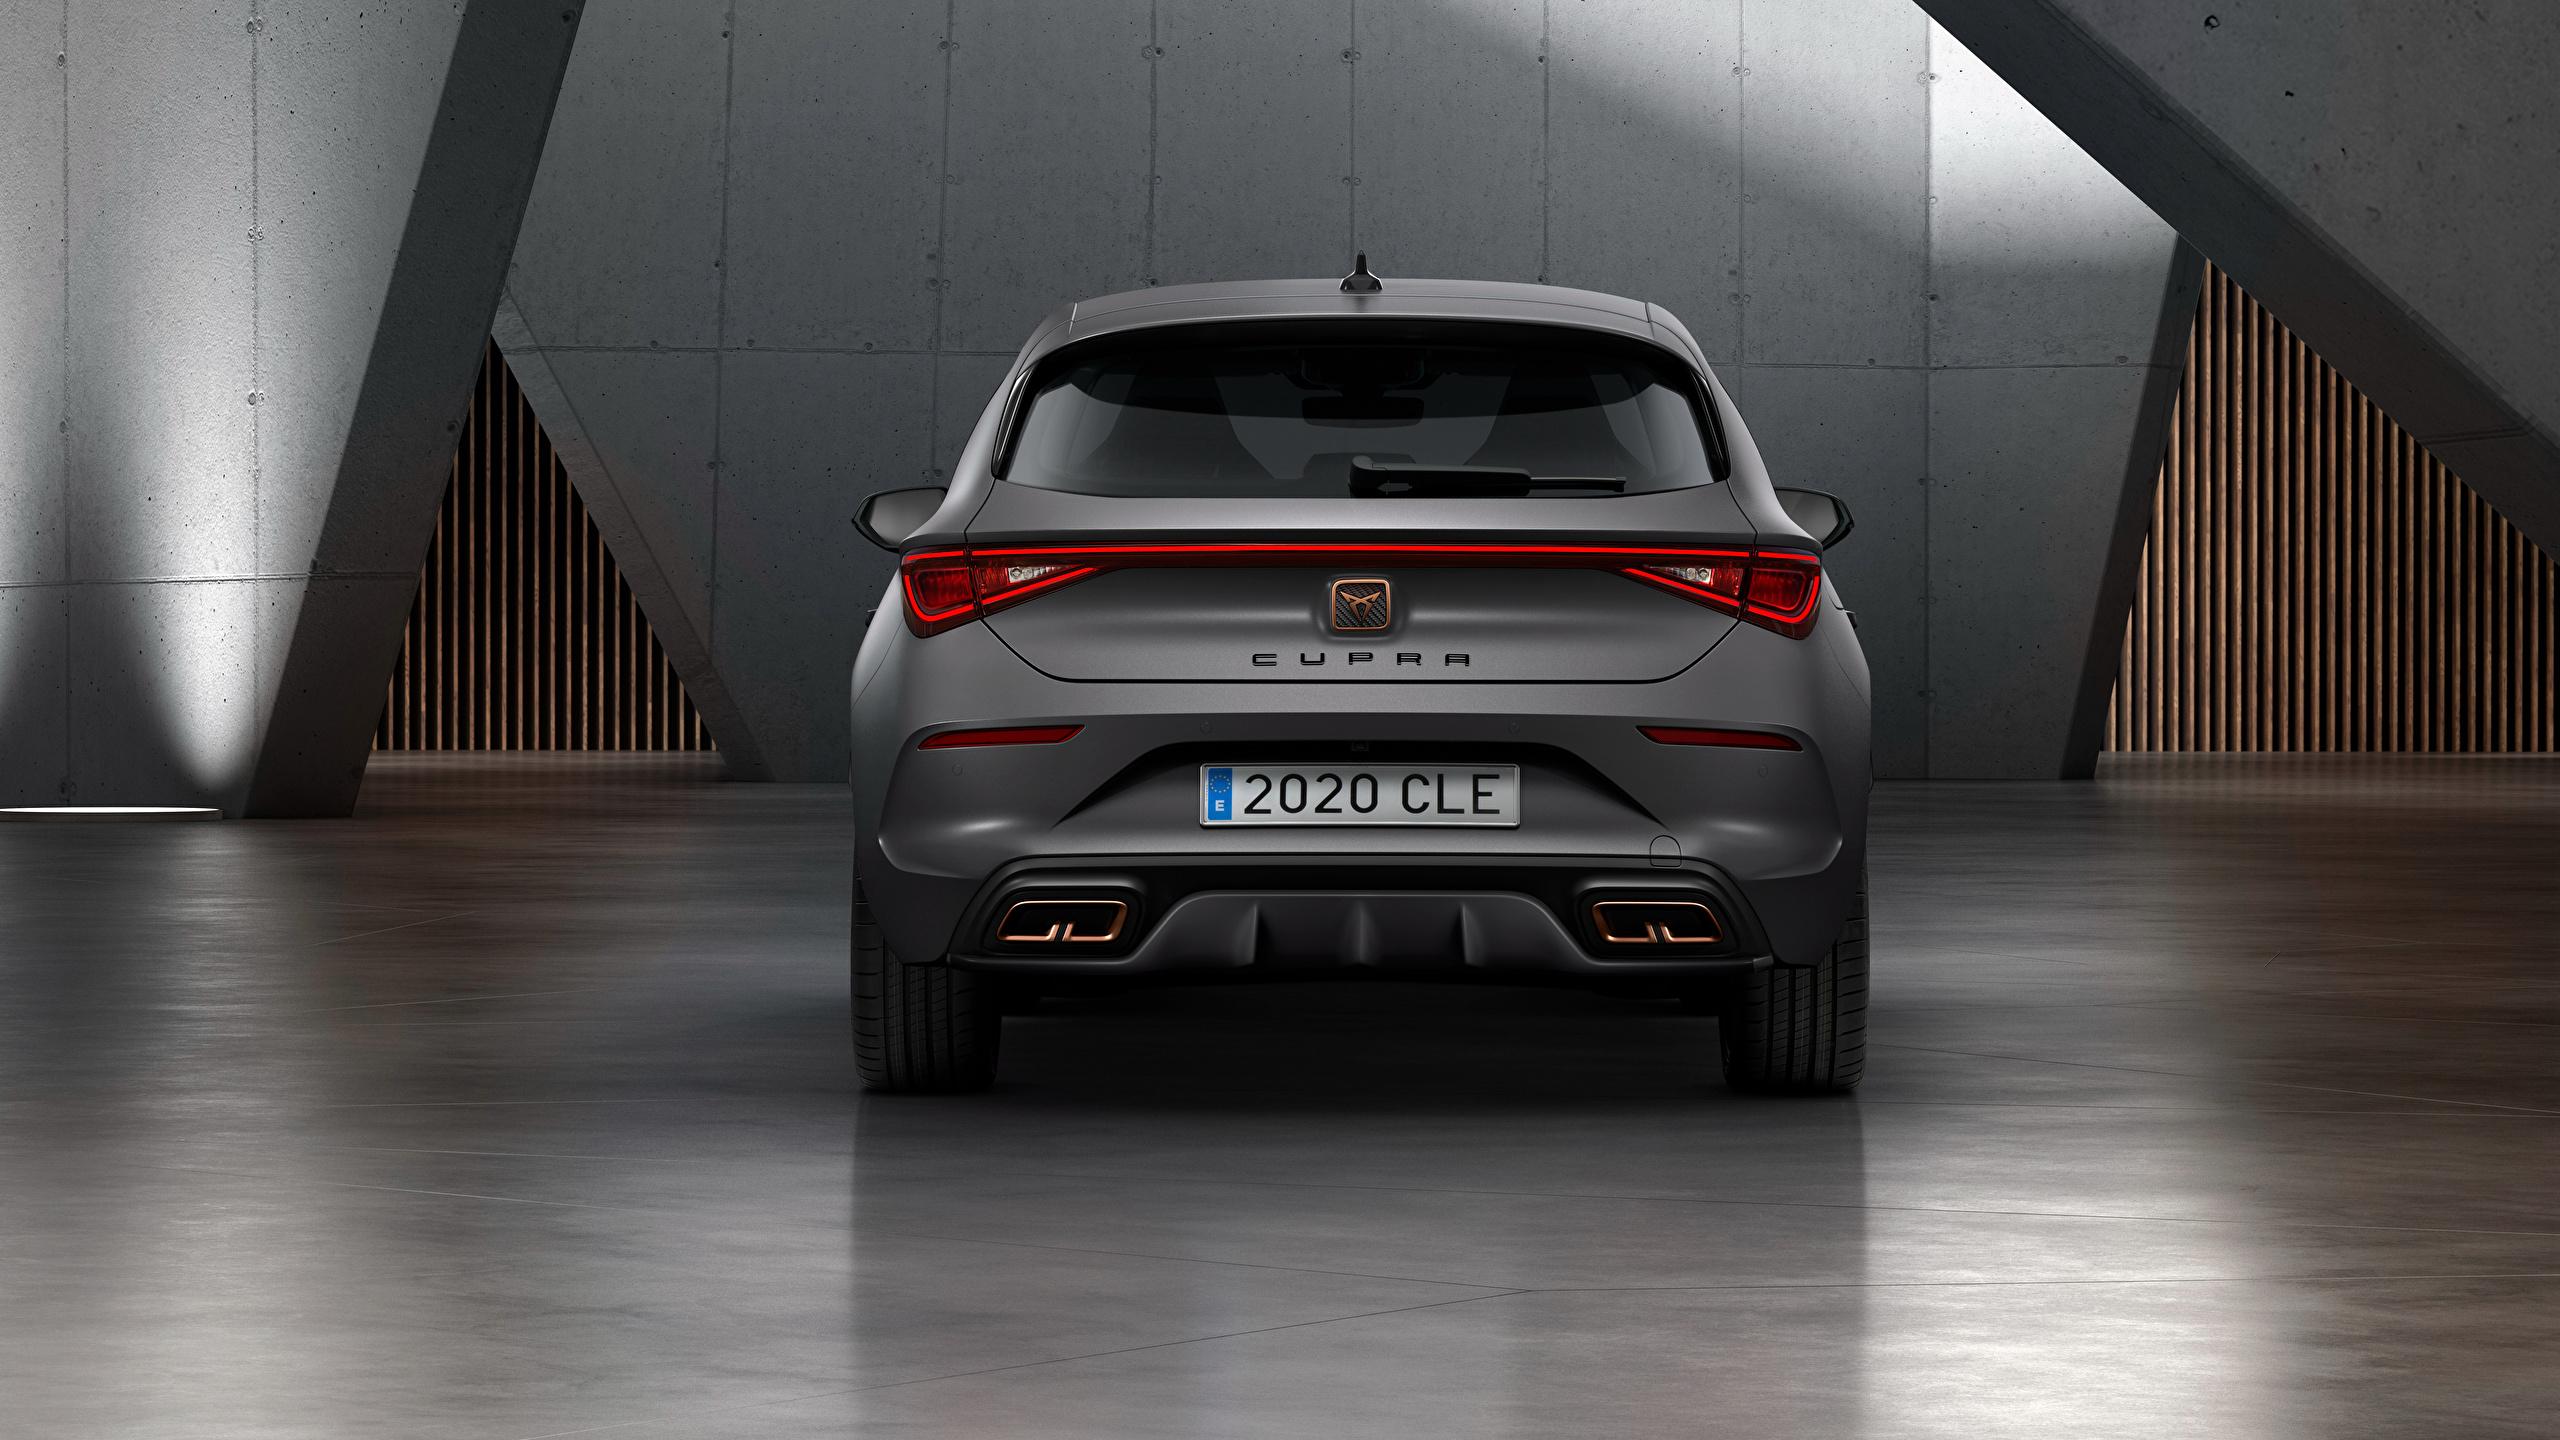 Fotos von Seat Cupra, Leon, eHybrid, Worldwide, 2020 graues Hinten automobil 2560x1440 Grau graue auto Autos